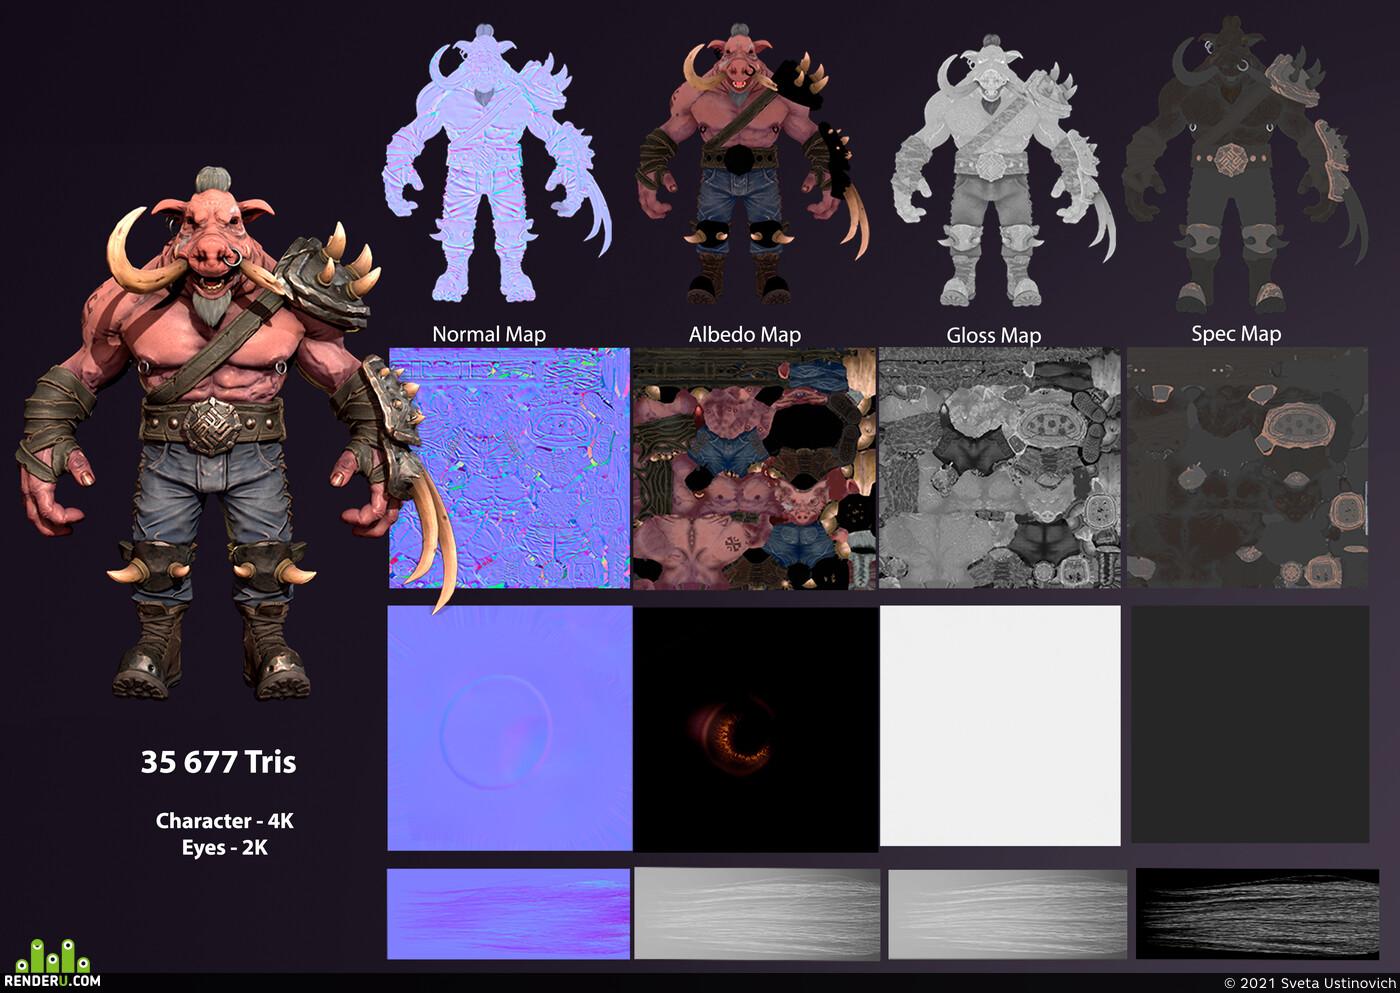 Zbrush, zbrushcharacter, characterdesign, game character